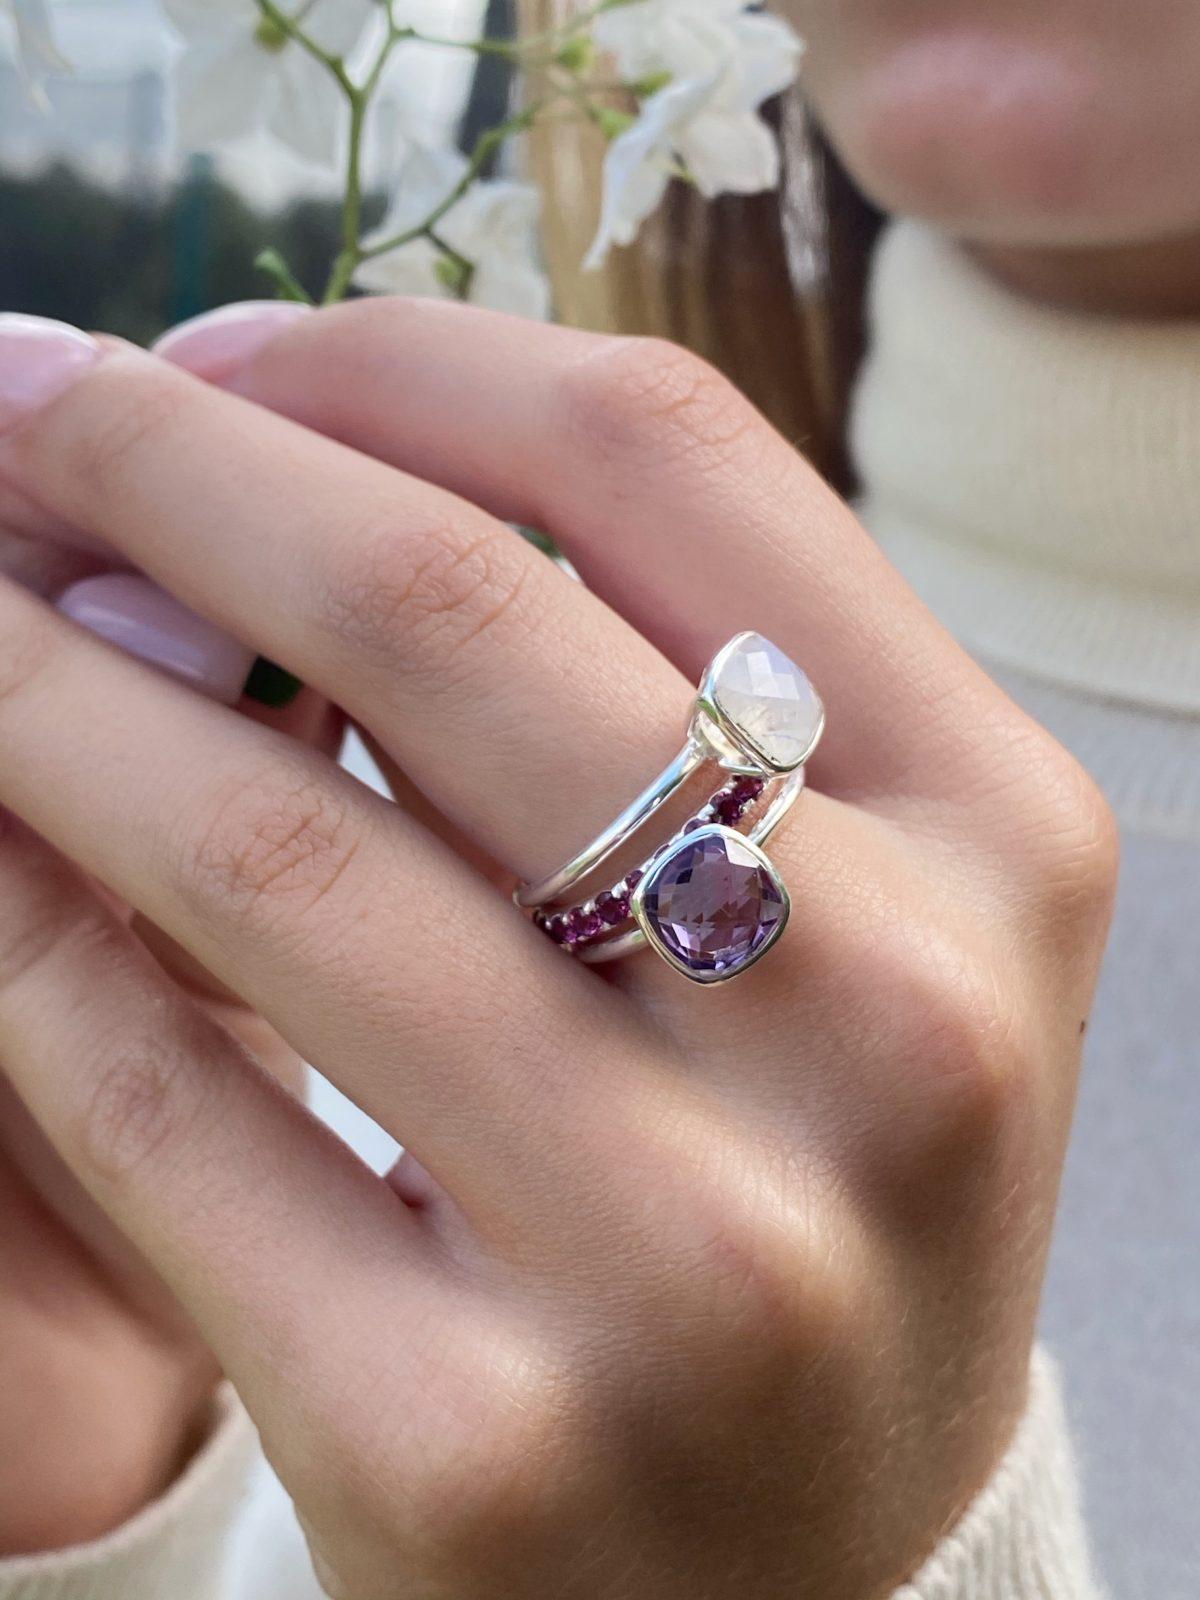 Rainbow Moonstone stacking ring.